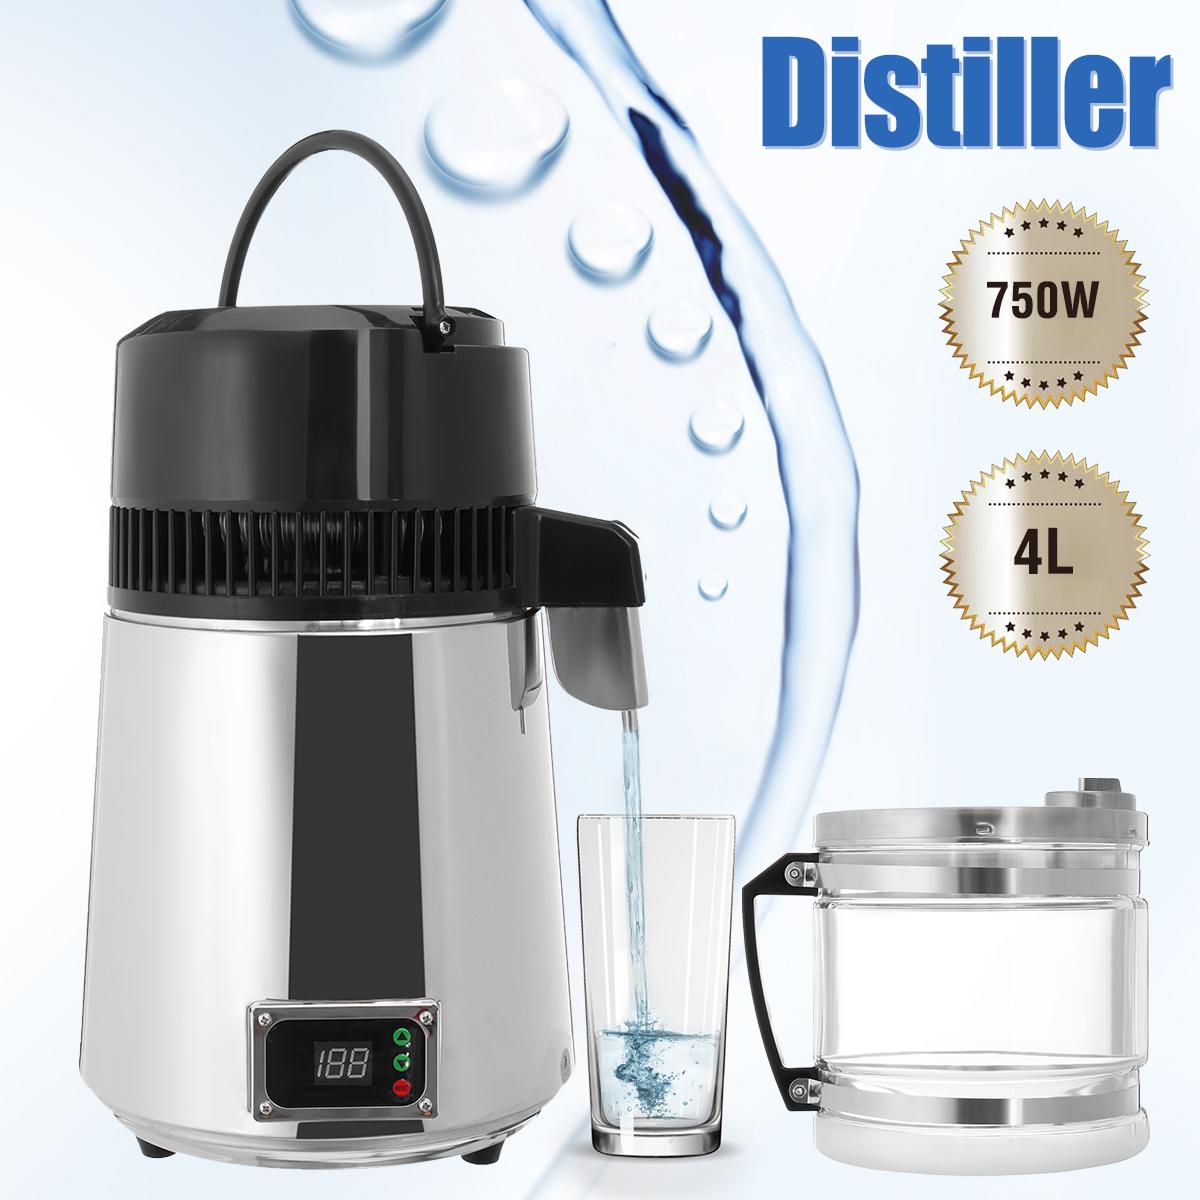 750W 4L Stainless Steel Pure Water Distiller 220V Purifier Filter LED Display Distilled Bottle